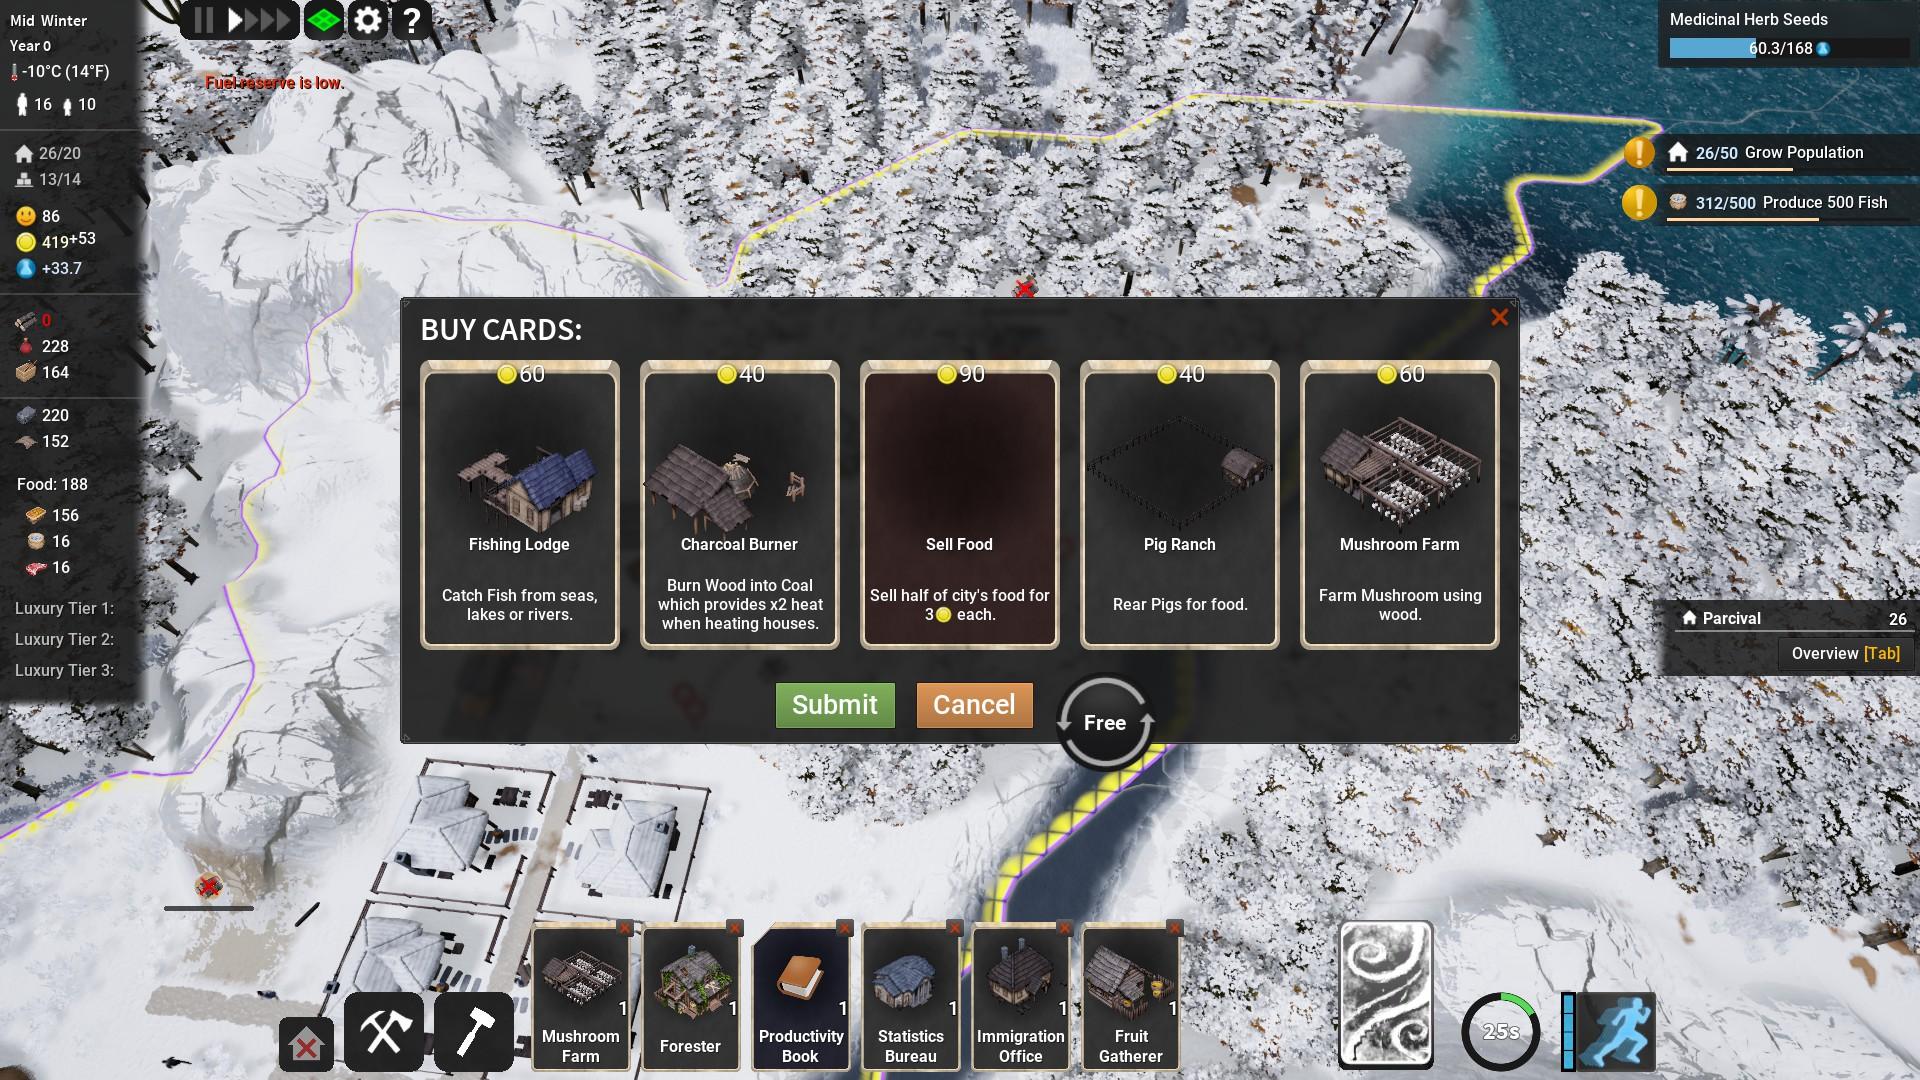 Kingdoms Reborn Property Cards